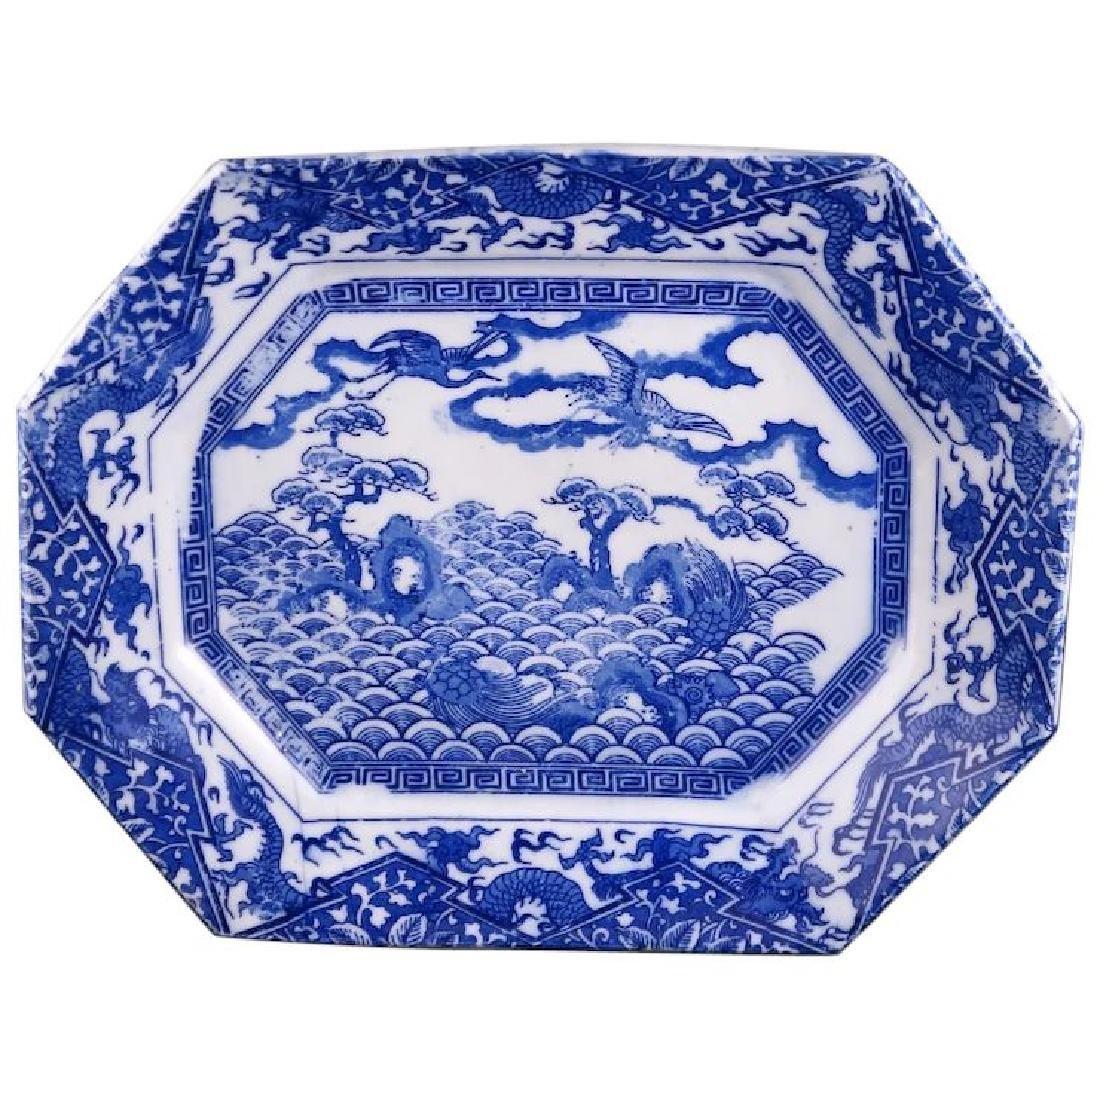 Blue and white Japanese Igezara porcelain stenciled